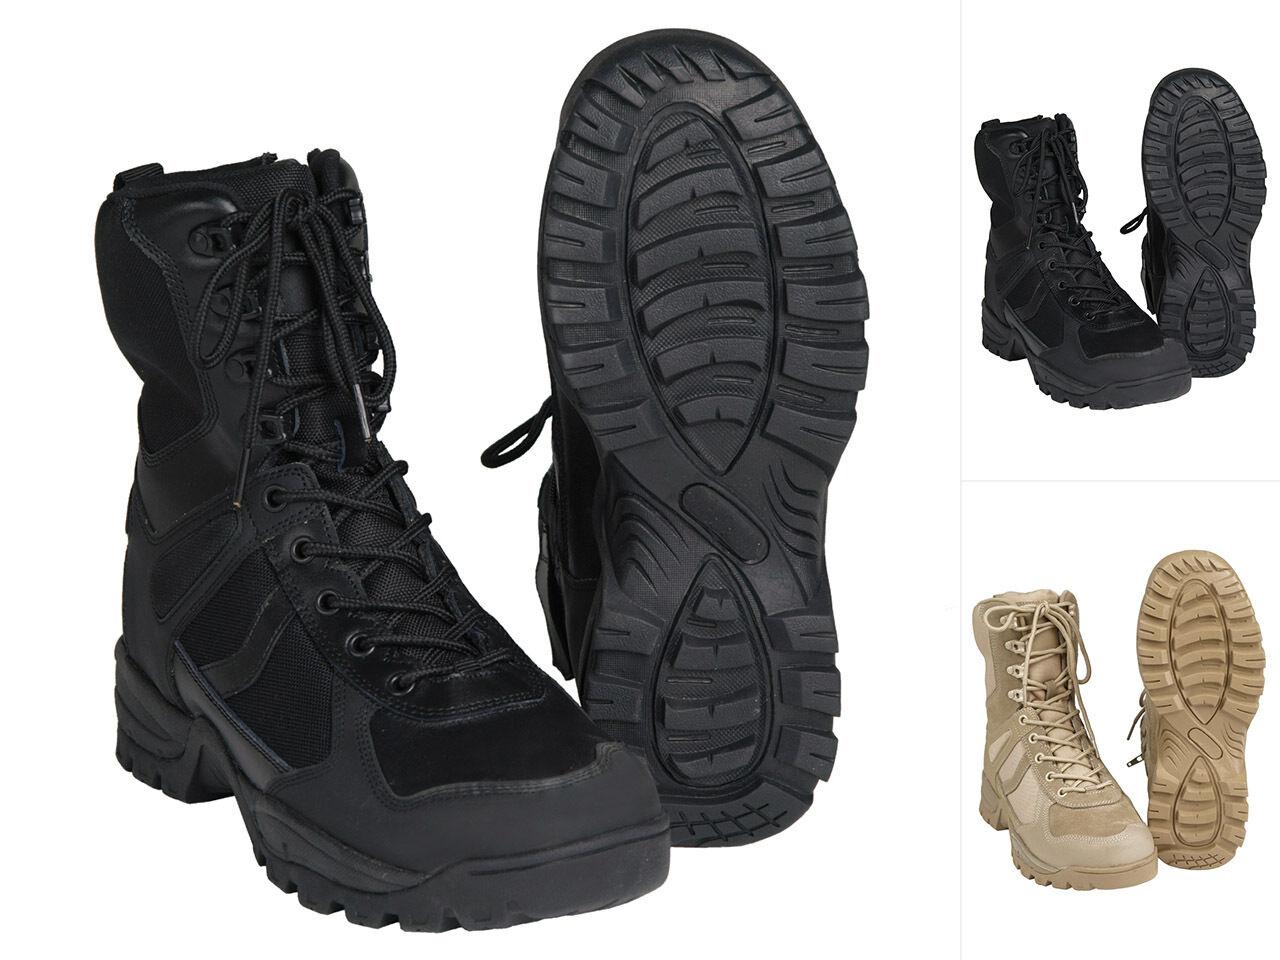 Mil-Tec Stiefel Patrol One Zip Schuhe Wanderschuhe Lederstiefel Boots 39-46